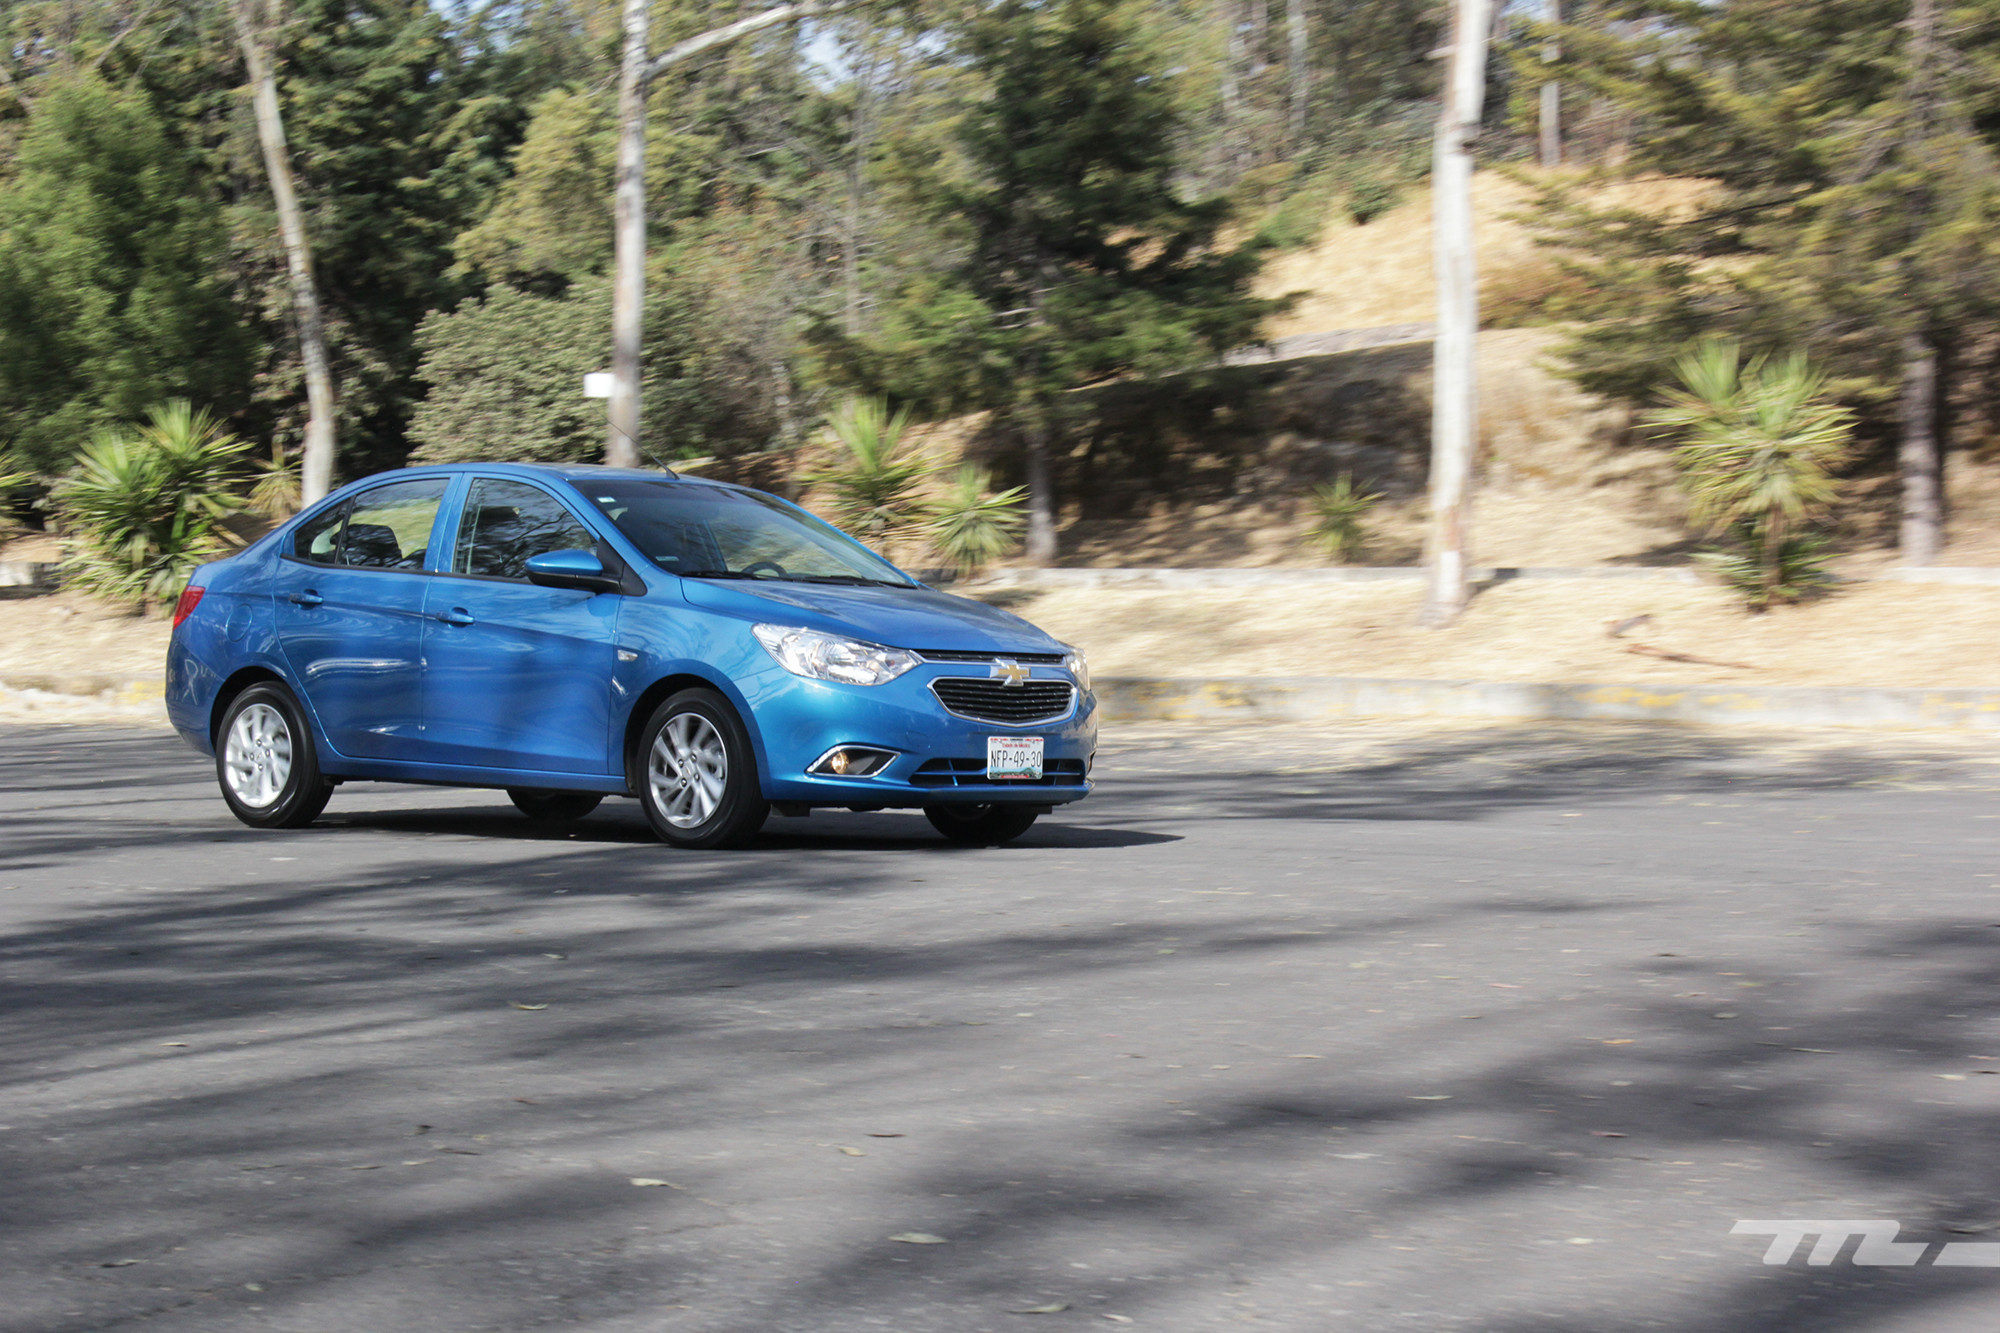 Foto de Chevrolet Aveo 2018 (prueba) (3/11)